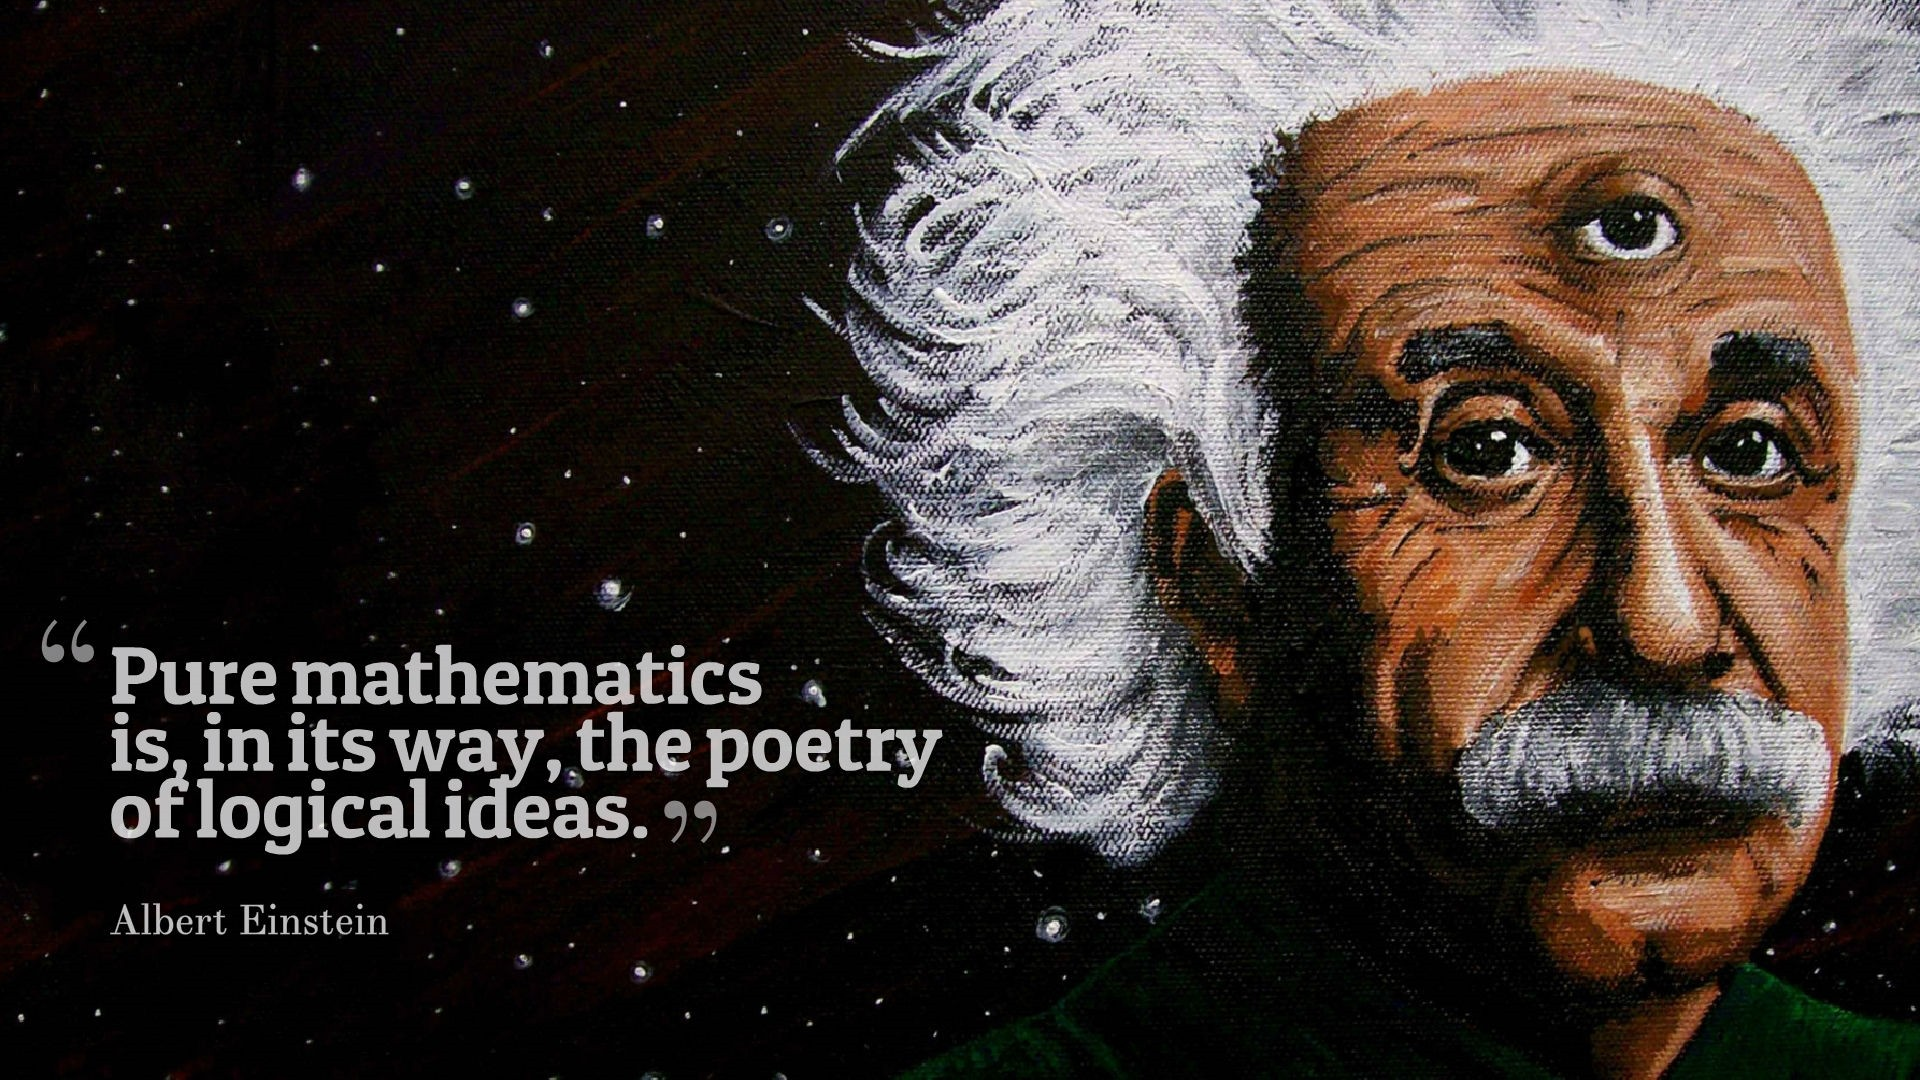 Albert Einstein a Wallpaper